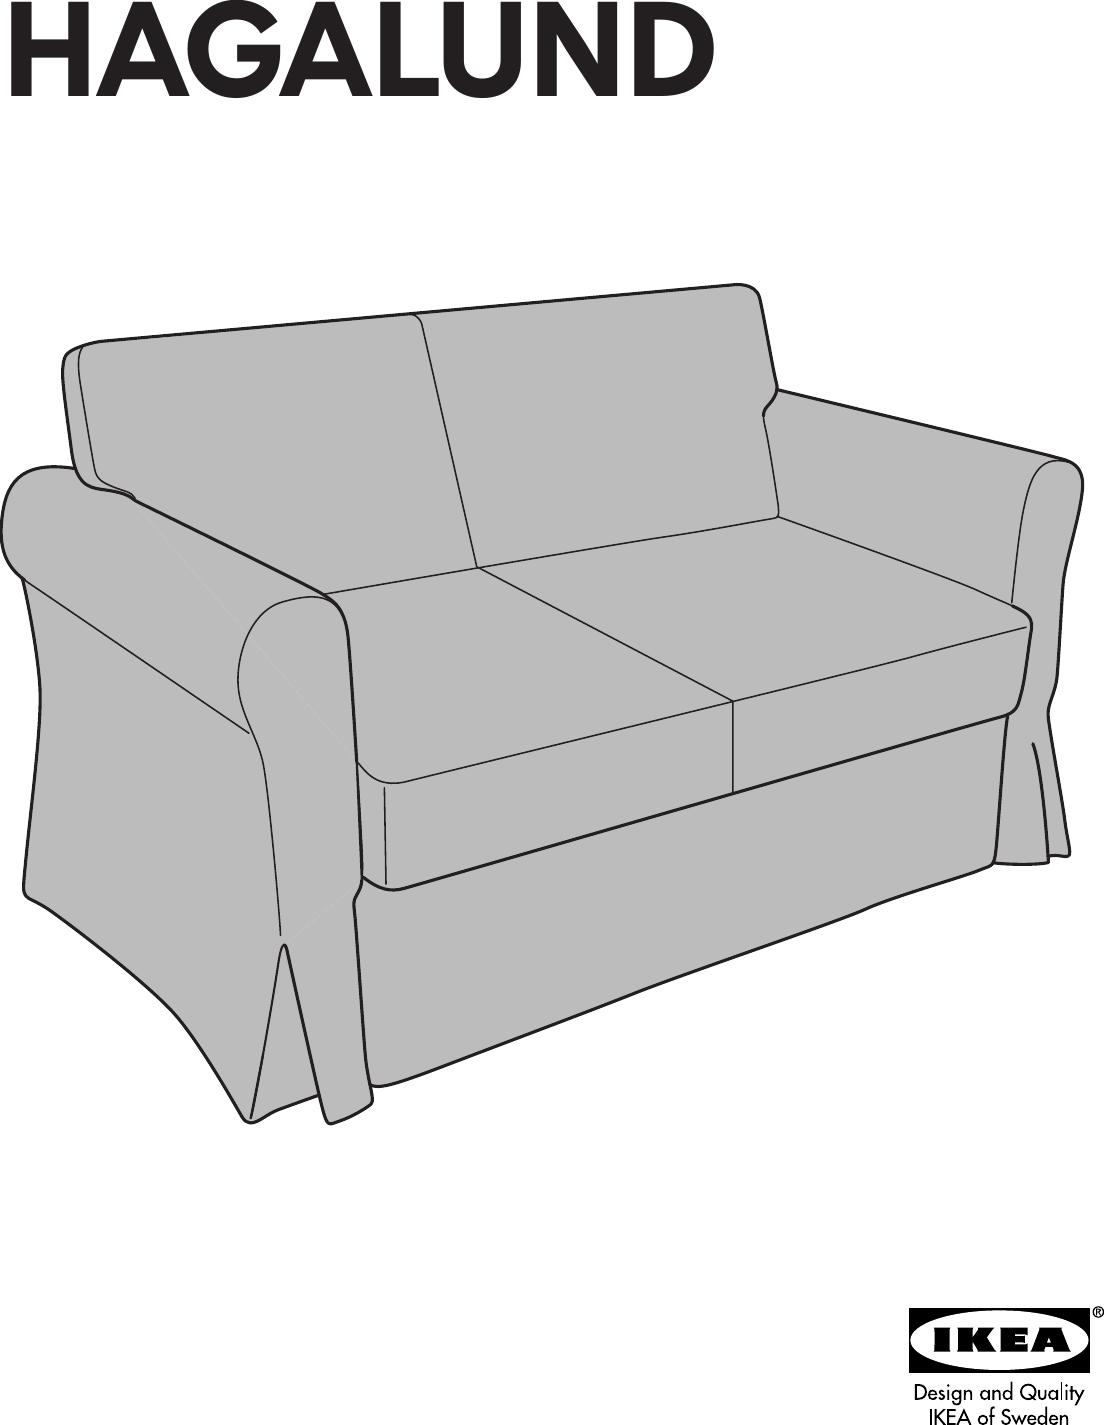 Awesome Ikea Hagalund Sofa Bed Cover Assembly Instruction Inzonedesignstudio Interior Chair Design Inzonedesignstudiocom